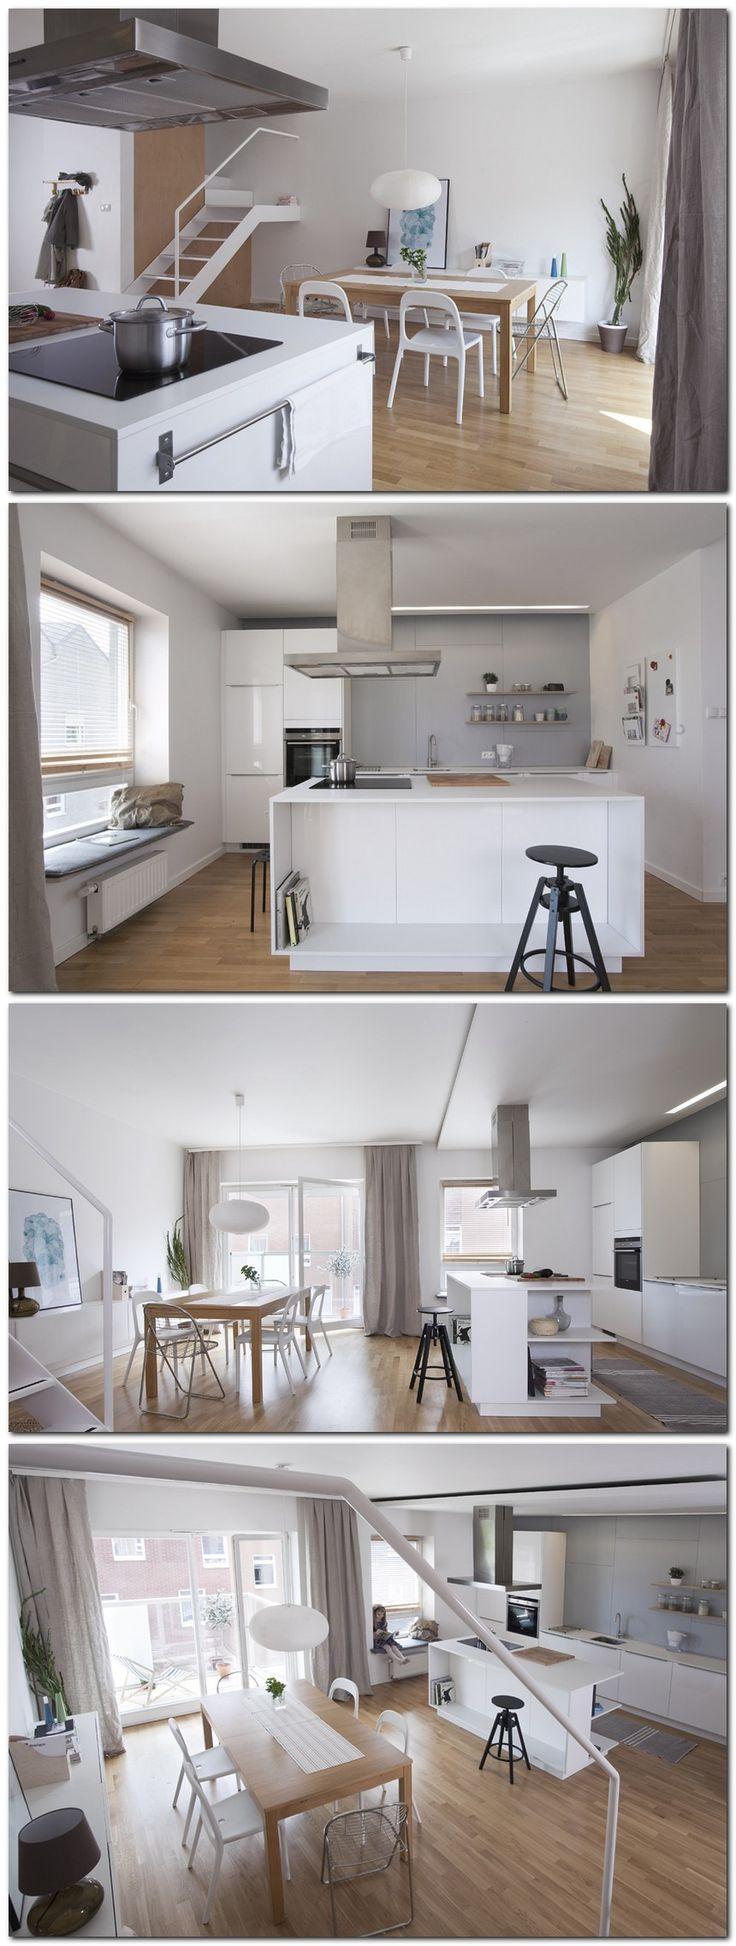 139 best Home like inspiration images on Pinterest | Arquitetura ...